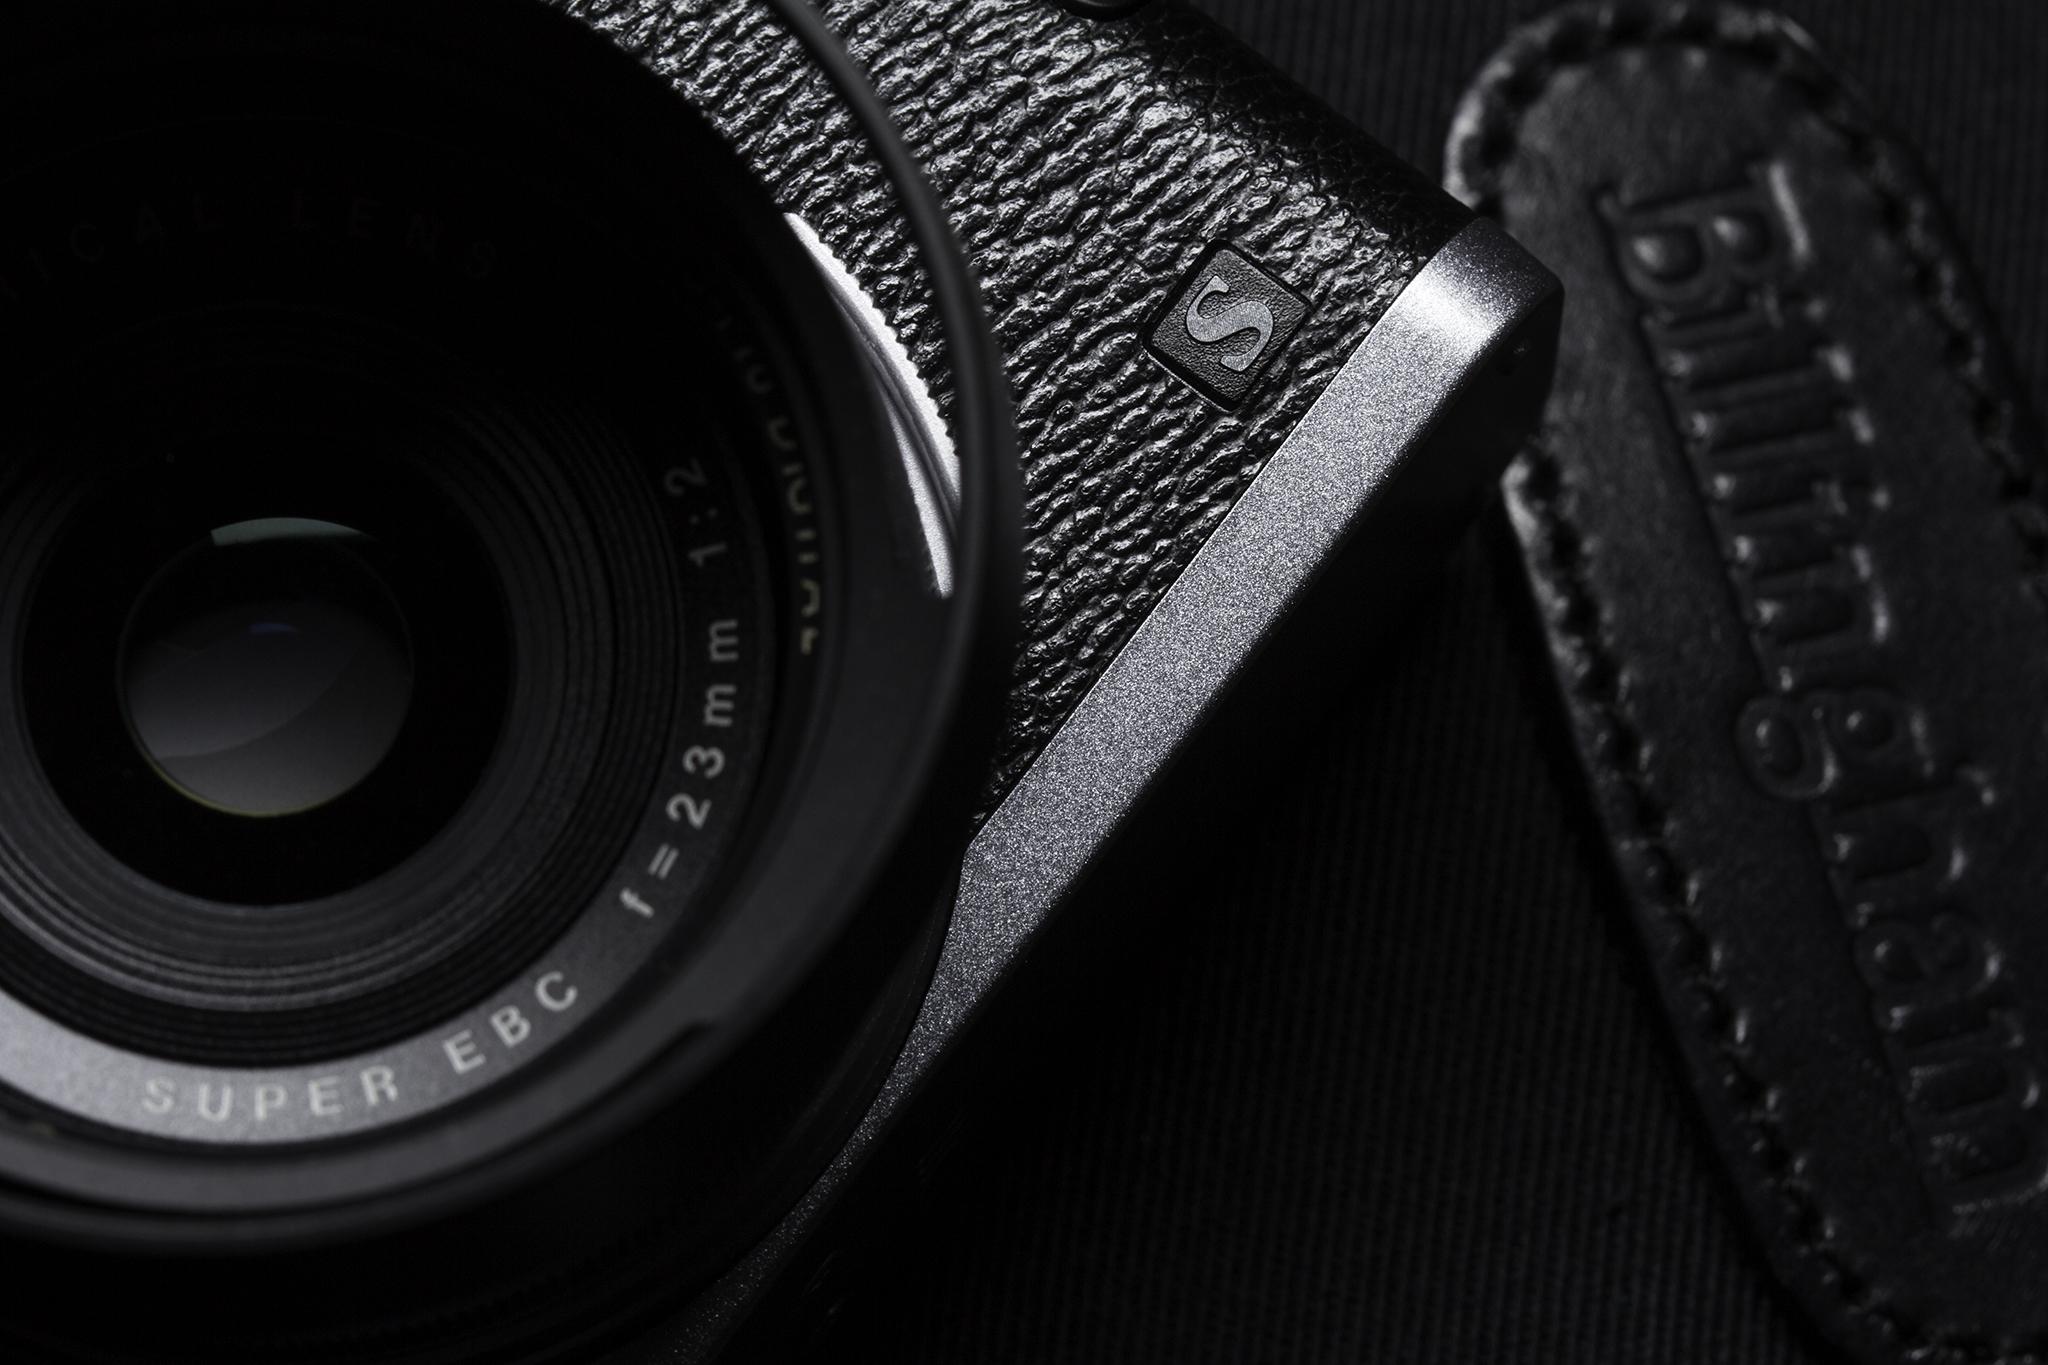 Simon_Rawling_Photography_x100s-1.jpg